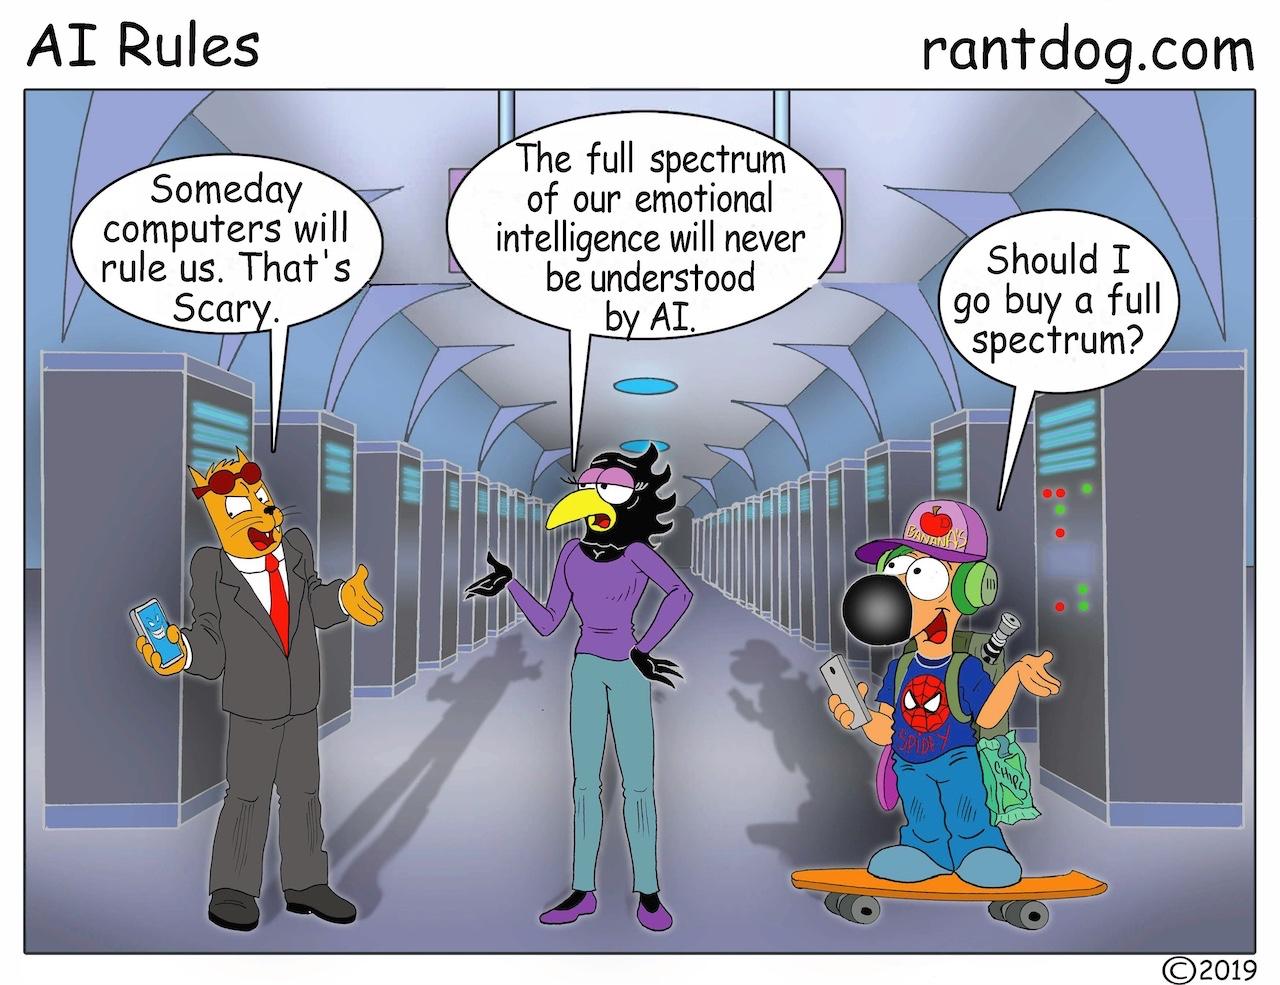 RDC_724a_AI Rules copy.jpg